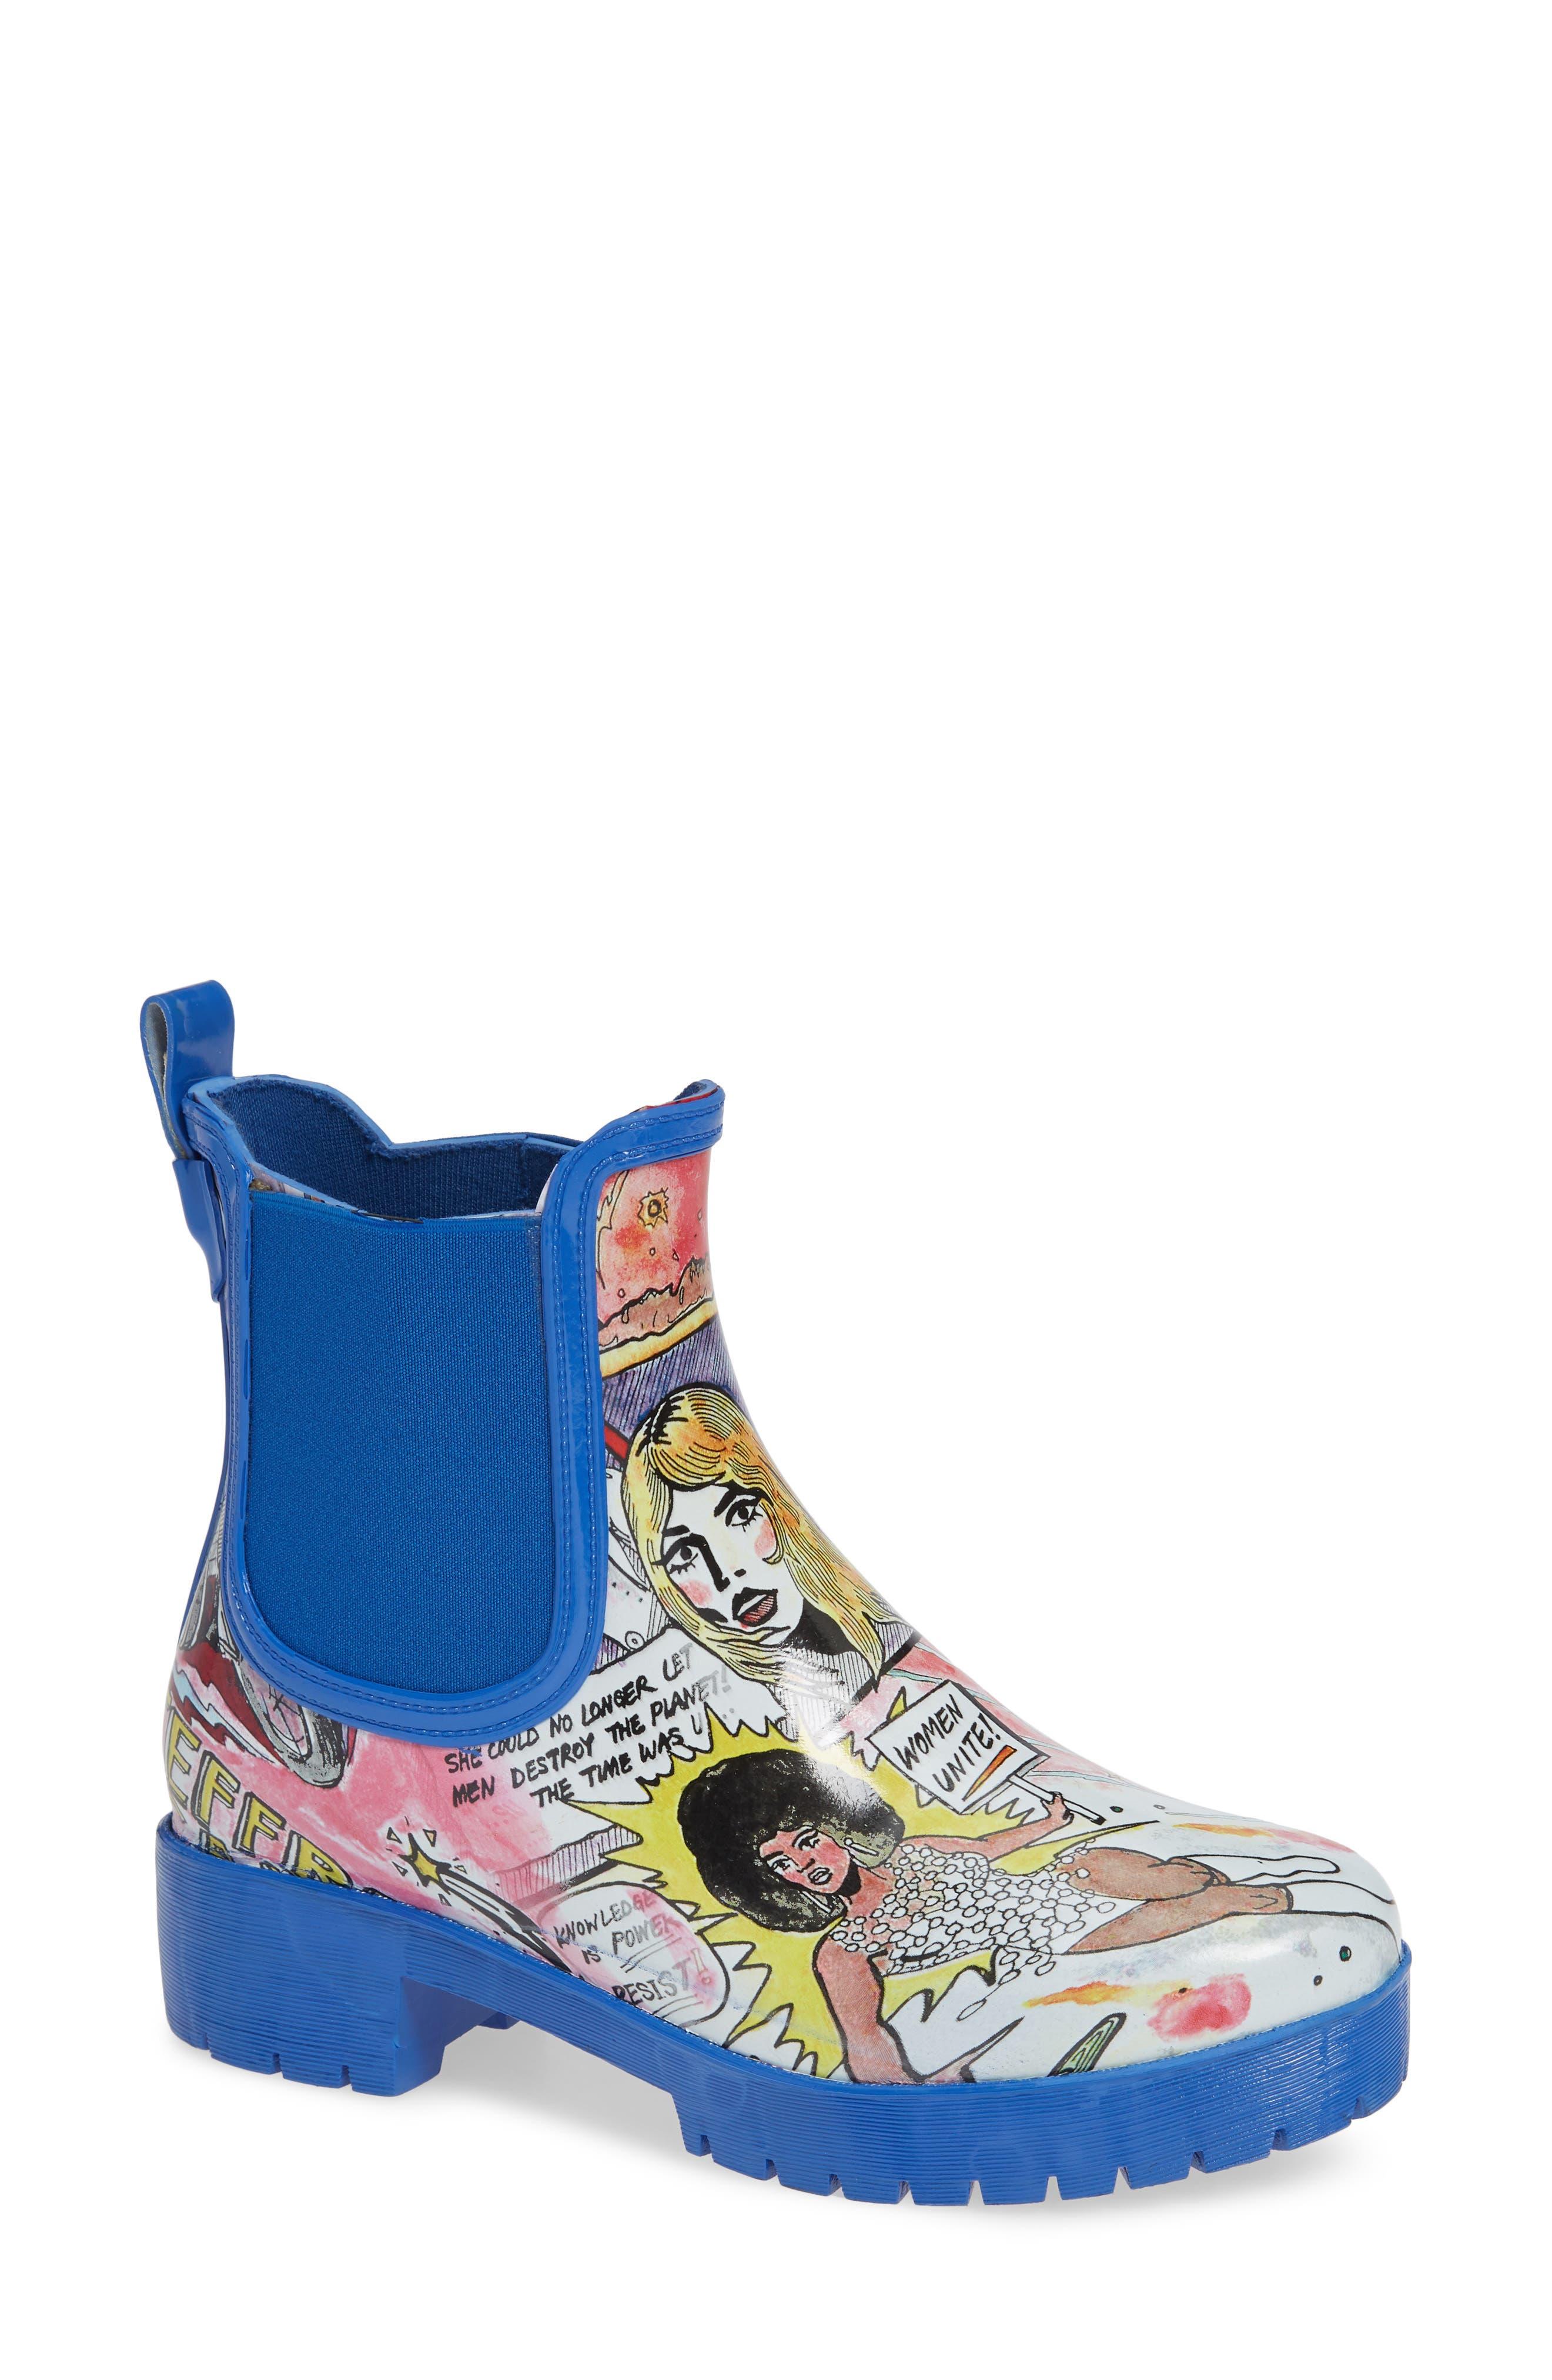 Cloudy Chelsea Rain Boot,                             Main thumbnail 1, color,                             COMIC PRINT